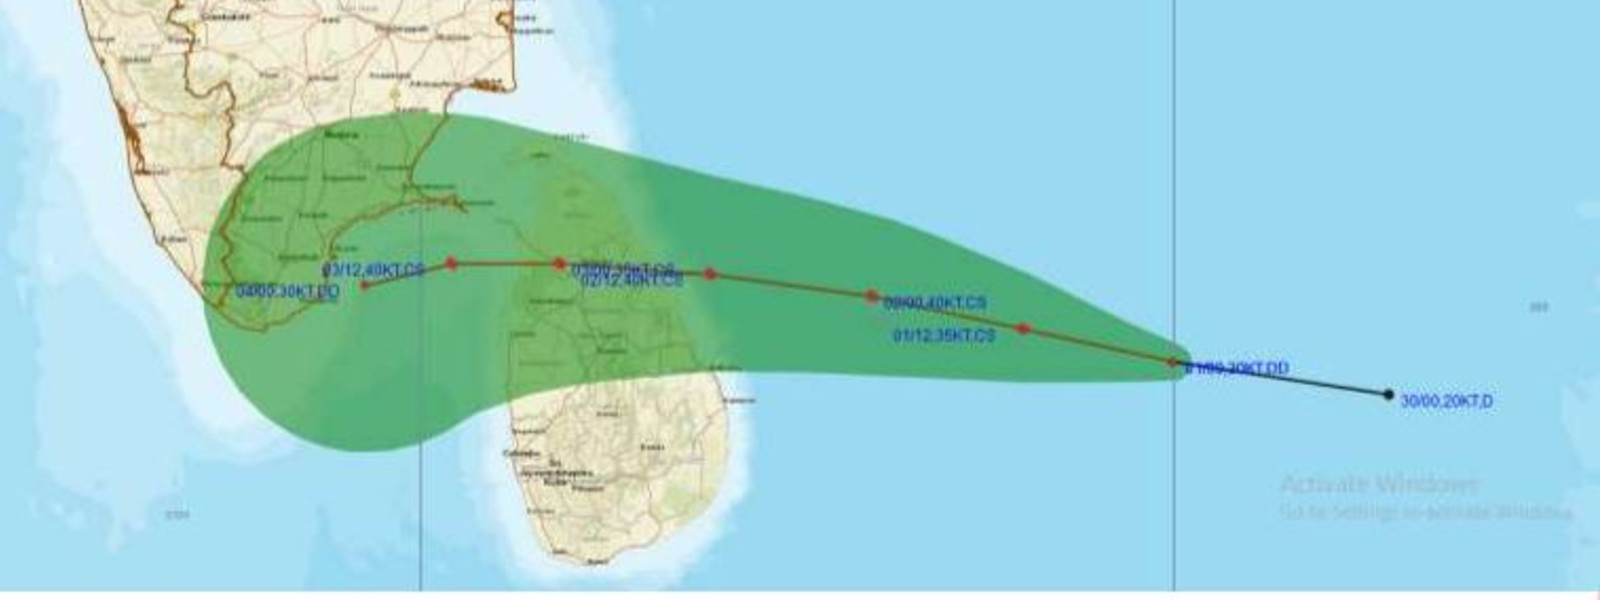 Cyclone to cross eastern coast of Sri Lanka on 02nd Dec.; Met Department